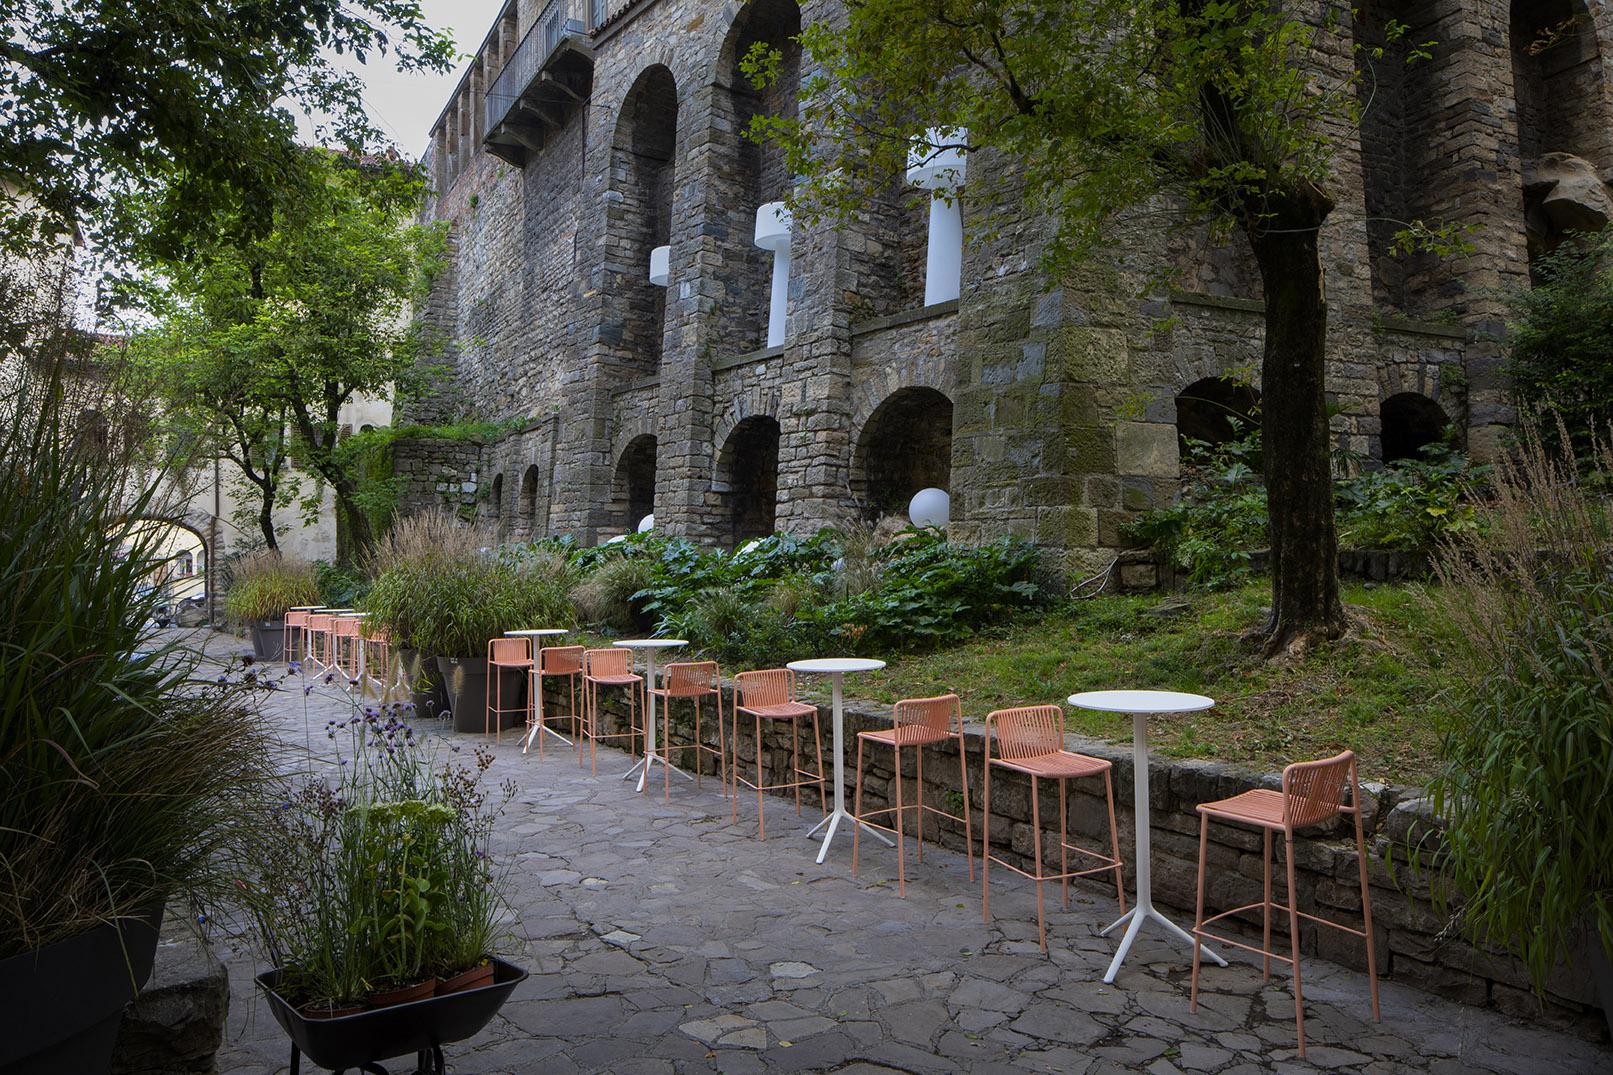 Mobili Da Giardino Bergamo.Arredo Giardino Bergamo Arredo Verde Di Una Terrazza In Una Casa D